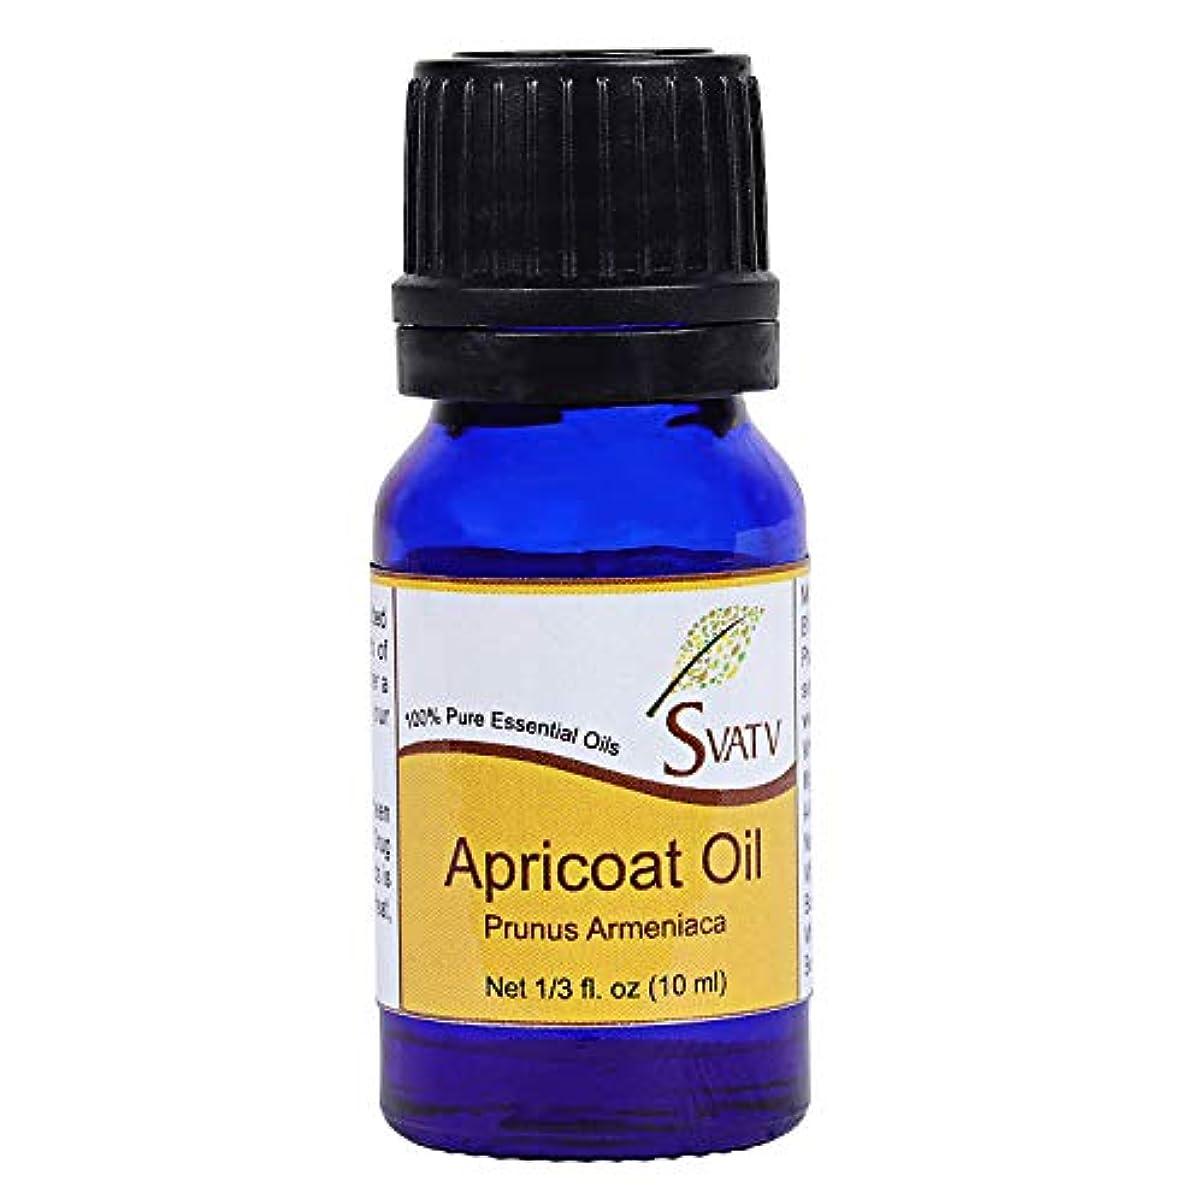 靴下カメラ致命的SVATV Apricot (Prunus Armeniaca) Essential Oil 10 mL (1/3 oz) Therapeutic Grade, Aromatherapy Essential Oil